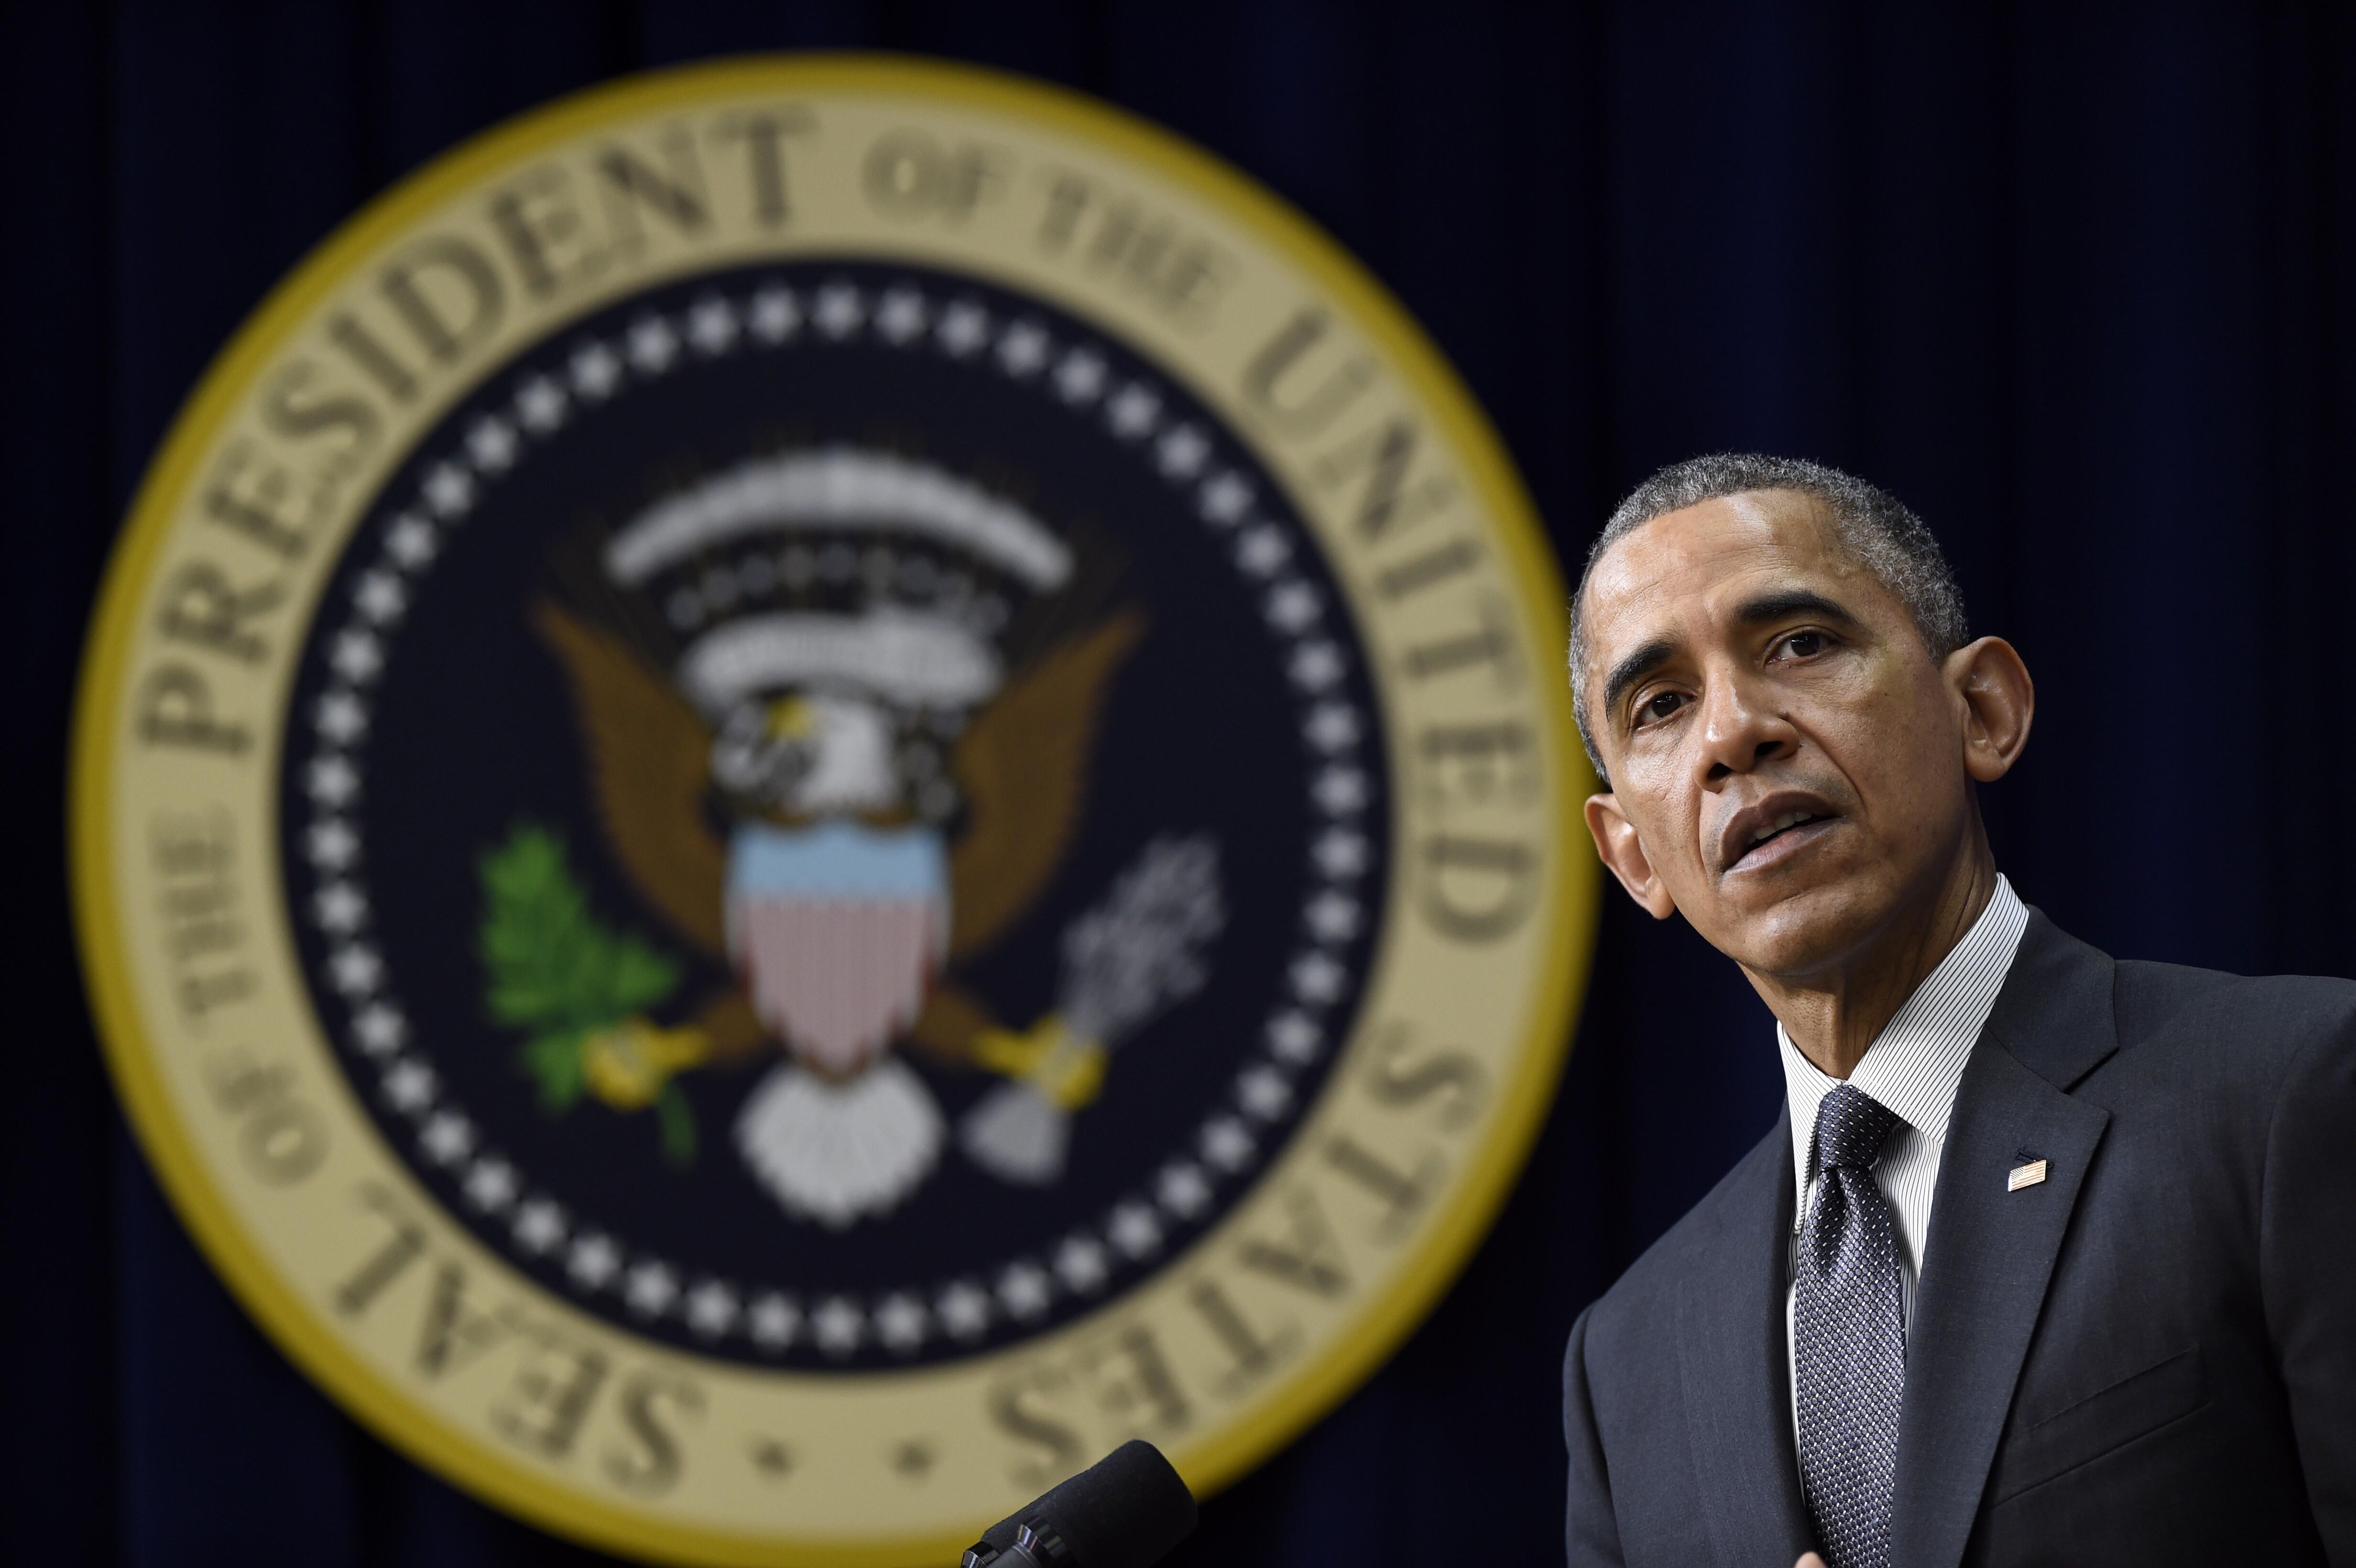 Obama: 'Prejudice and discrimination helps' the Islamic State